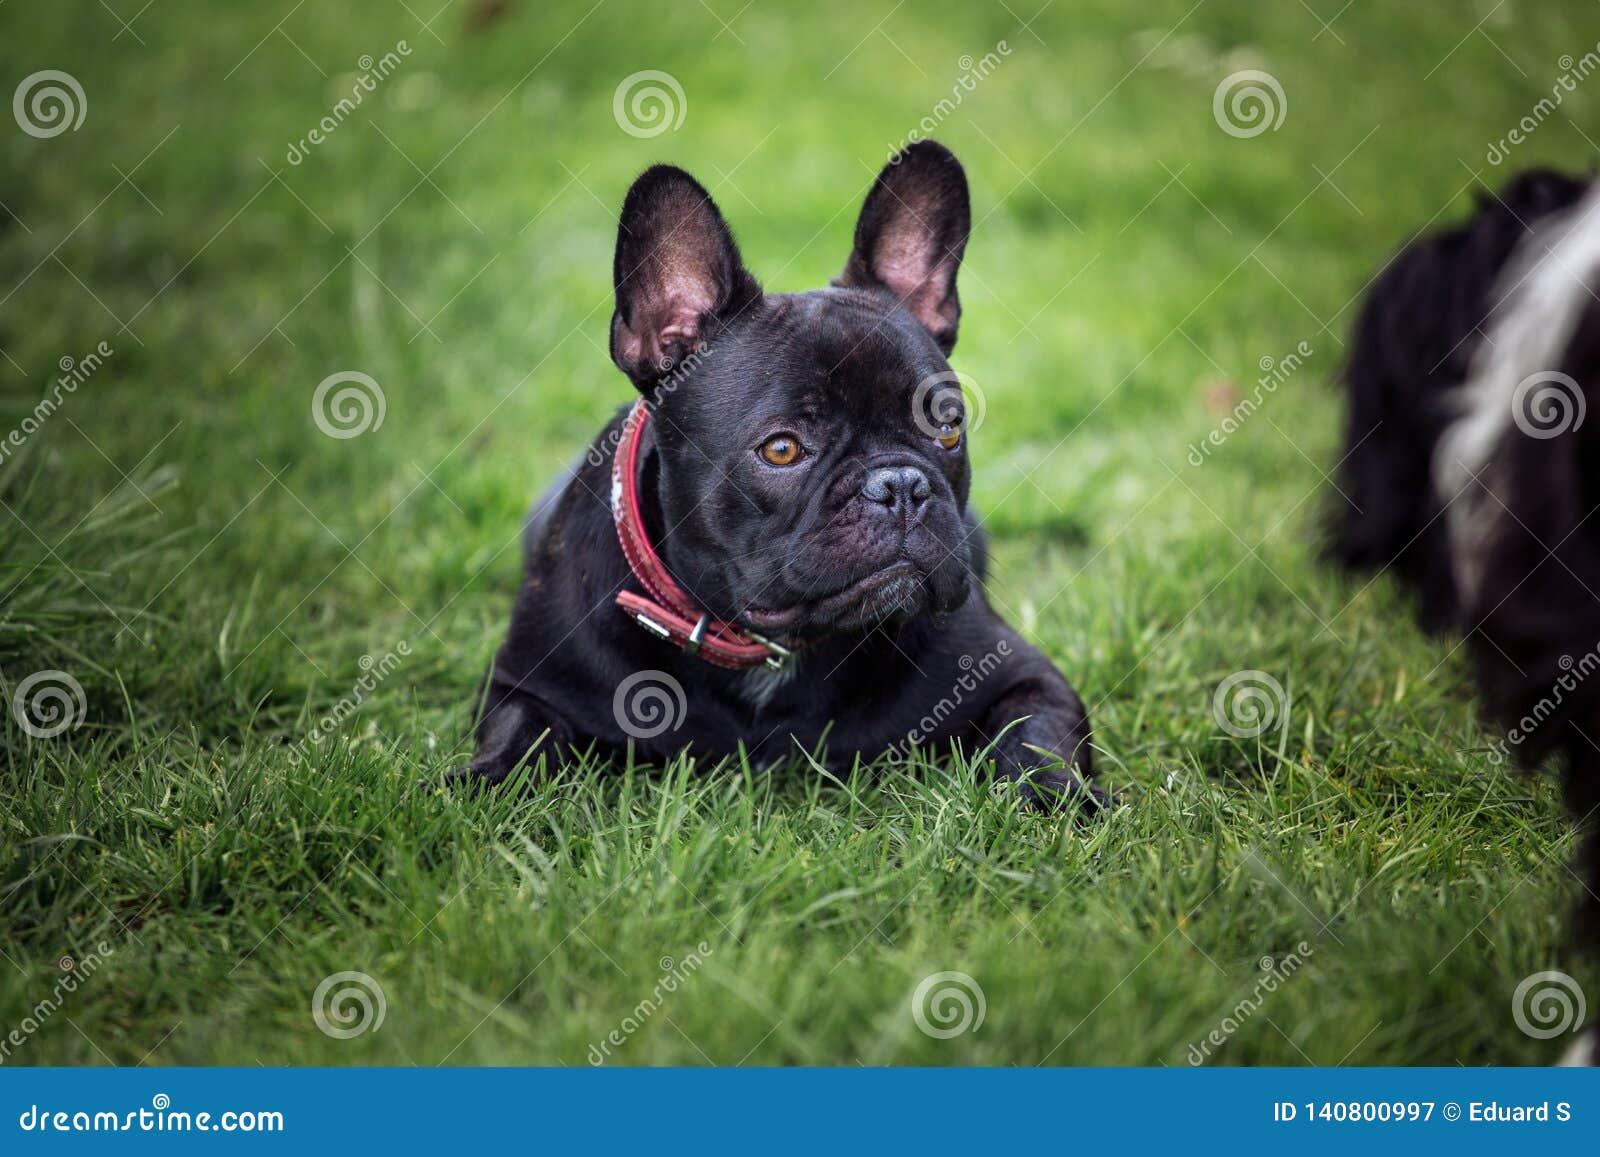 Black French Bulldog Puppy Laying In Gras Stock Image Image Of Purebred Bulldog 140800997